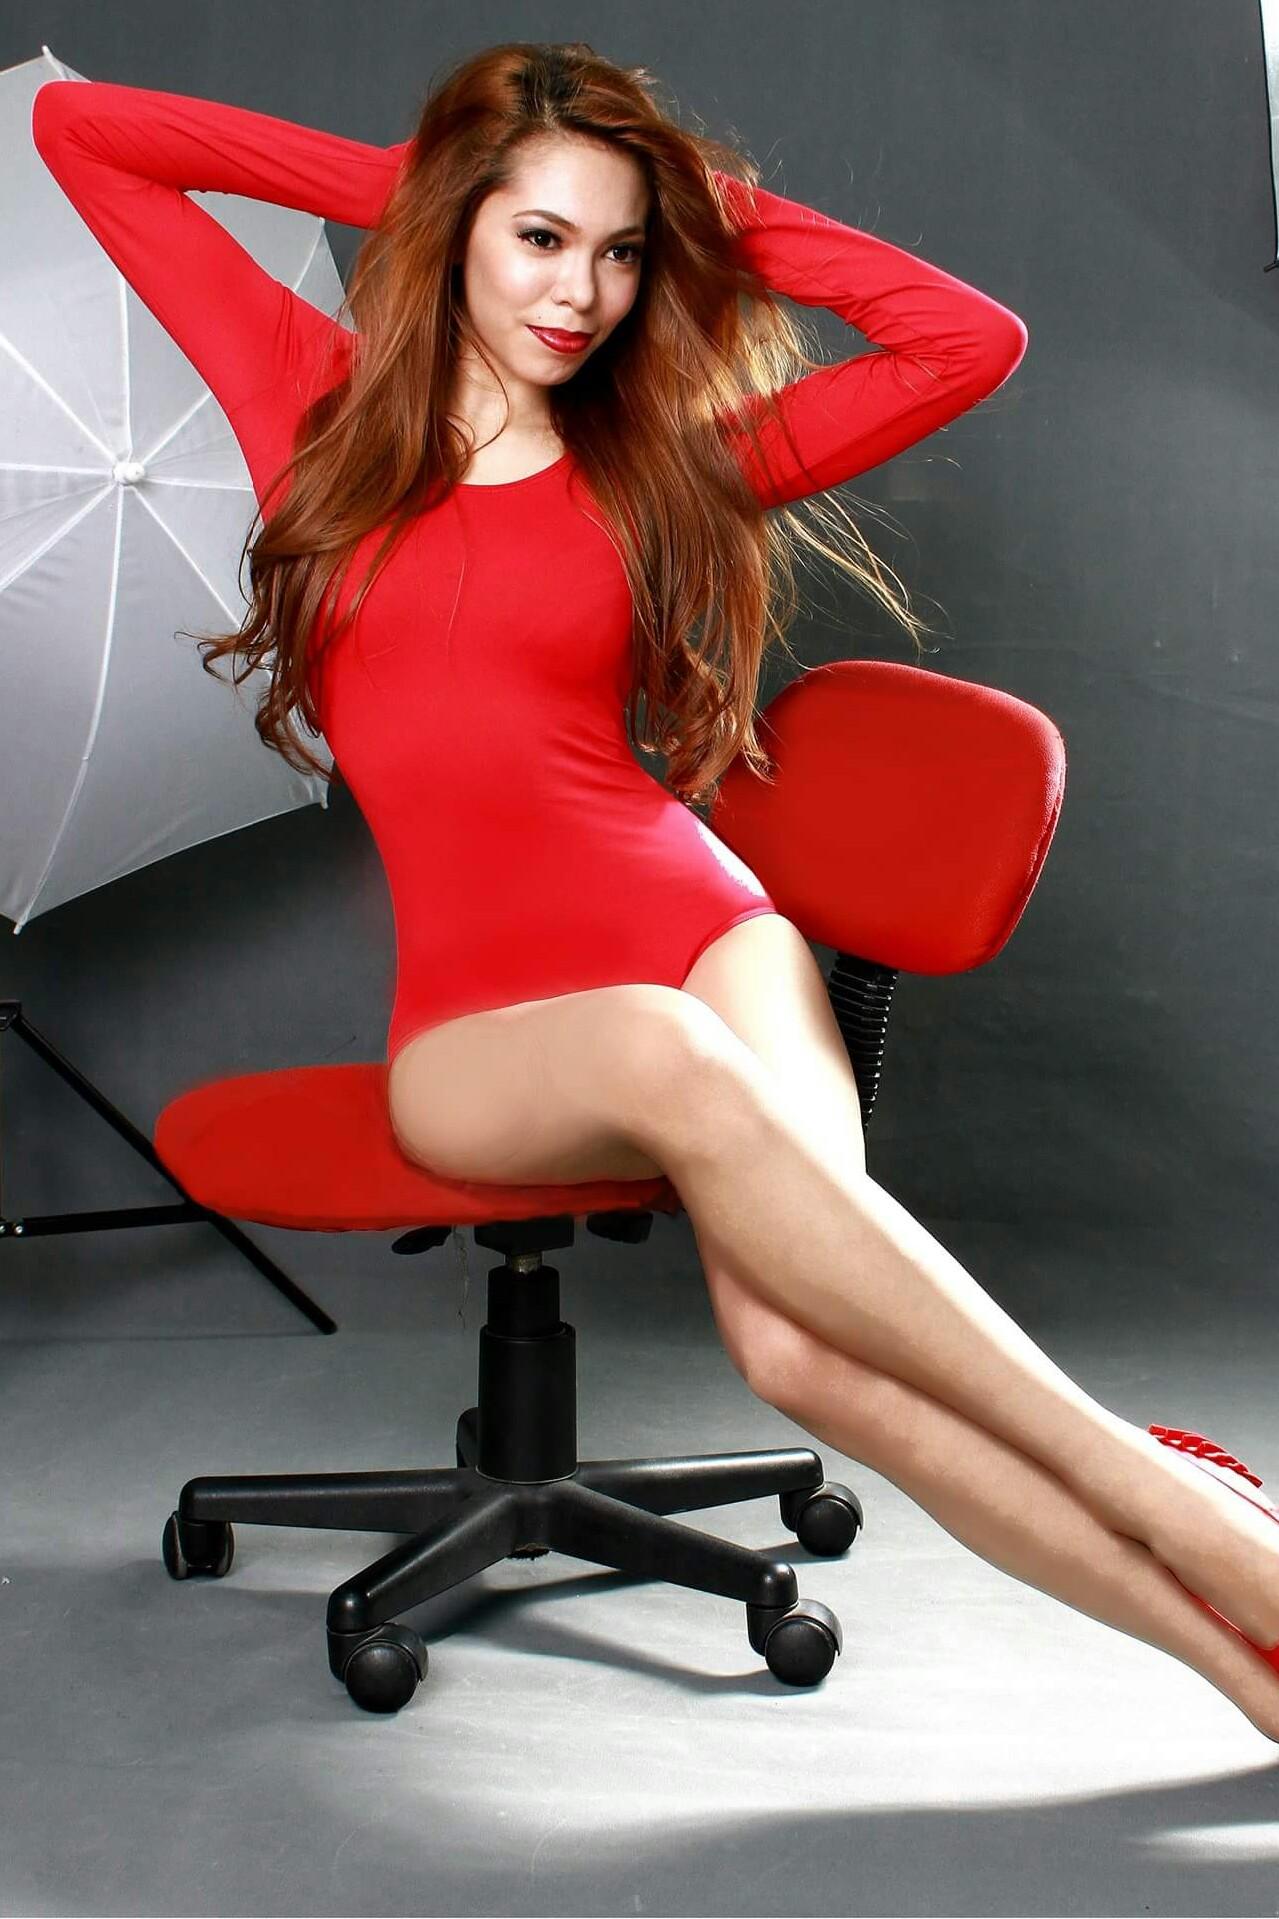 Emma Rueda - Busty Pinay Hottie Chick   Pinays Finest